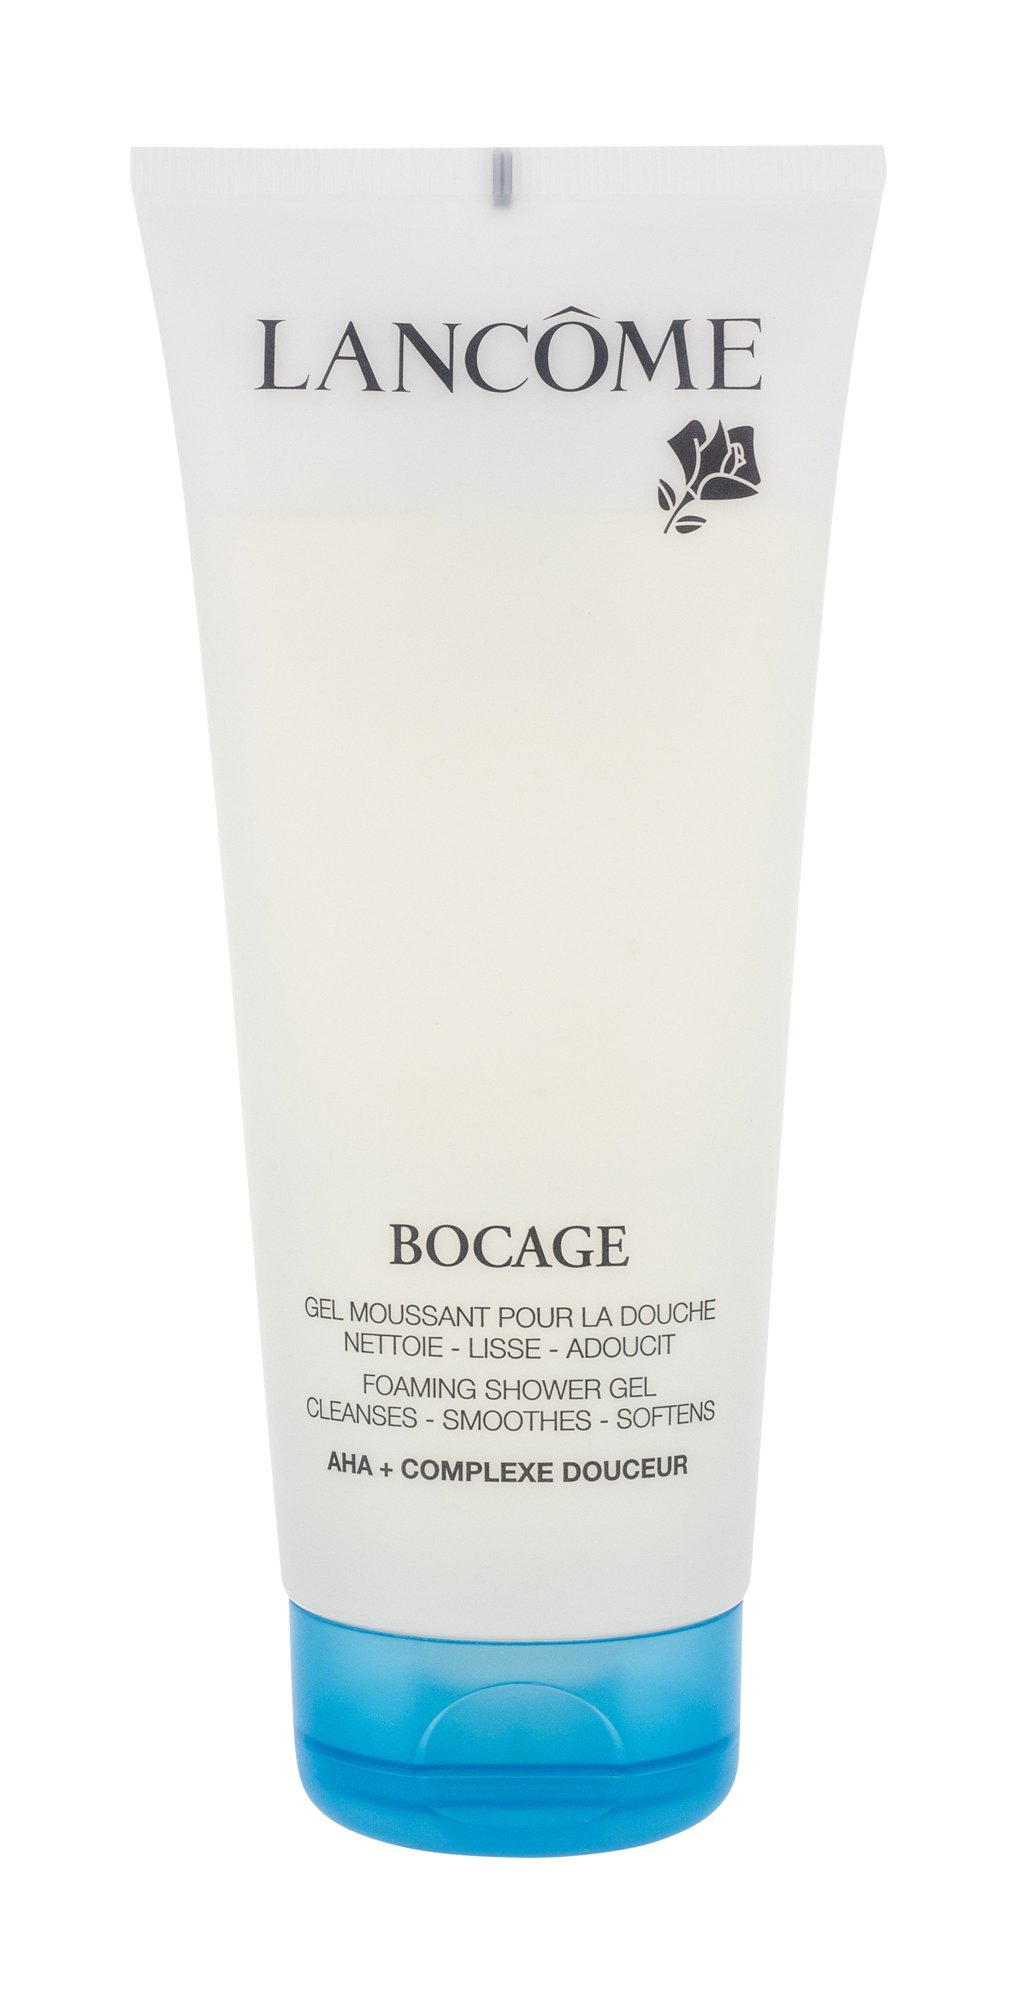 Lancôme Bocage Cosmetic 200ml